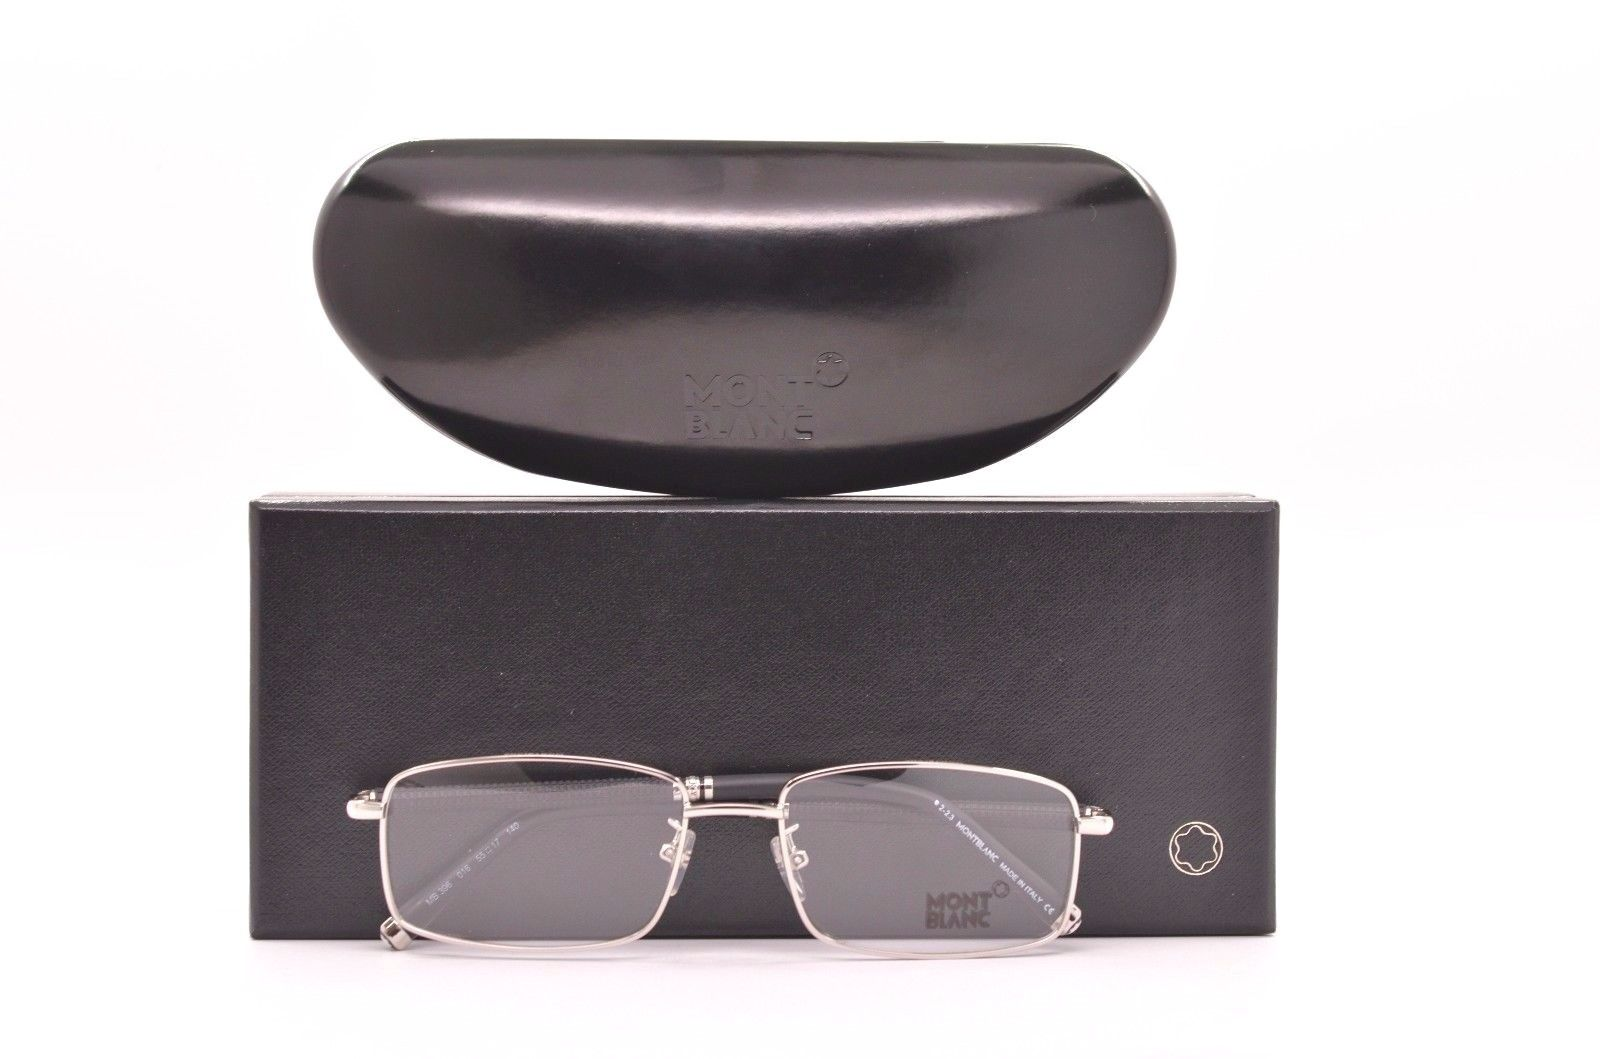 Kính mắt MontBlanc Eyewear, Shiny Palladium MB 396 016